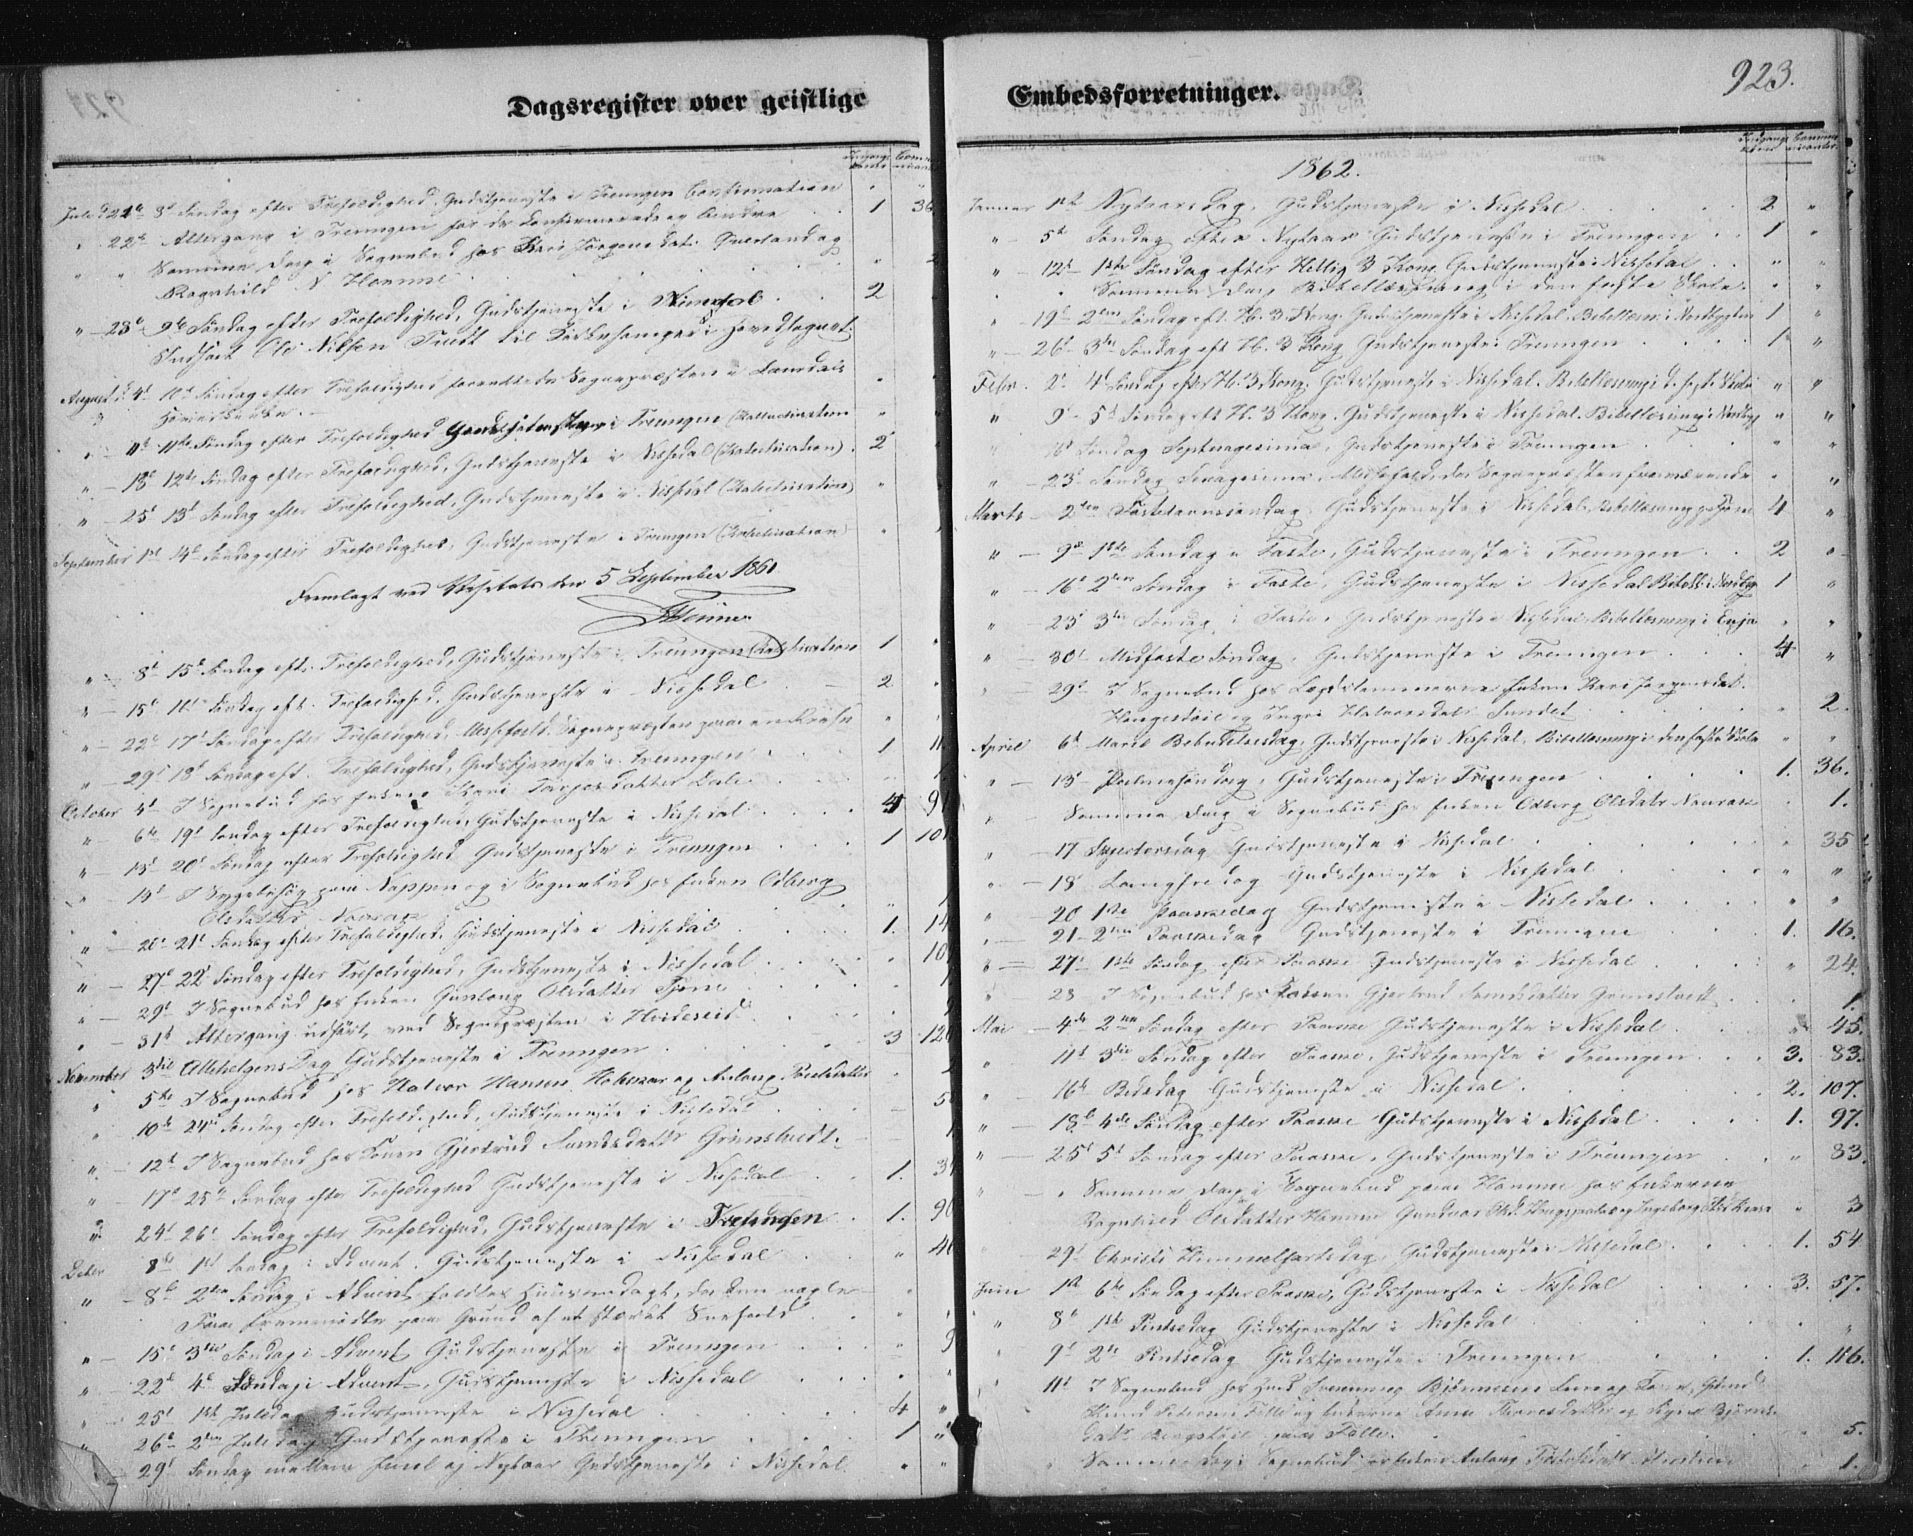 SAKO, Nissedal kirkebøker, F/Fa/L0003: Ministerialbok nr. I 3, 1846-1870, s. 922-923